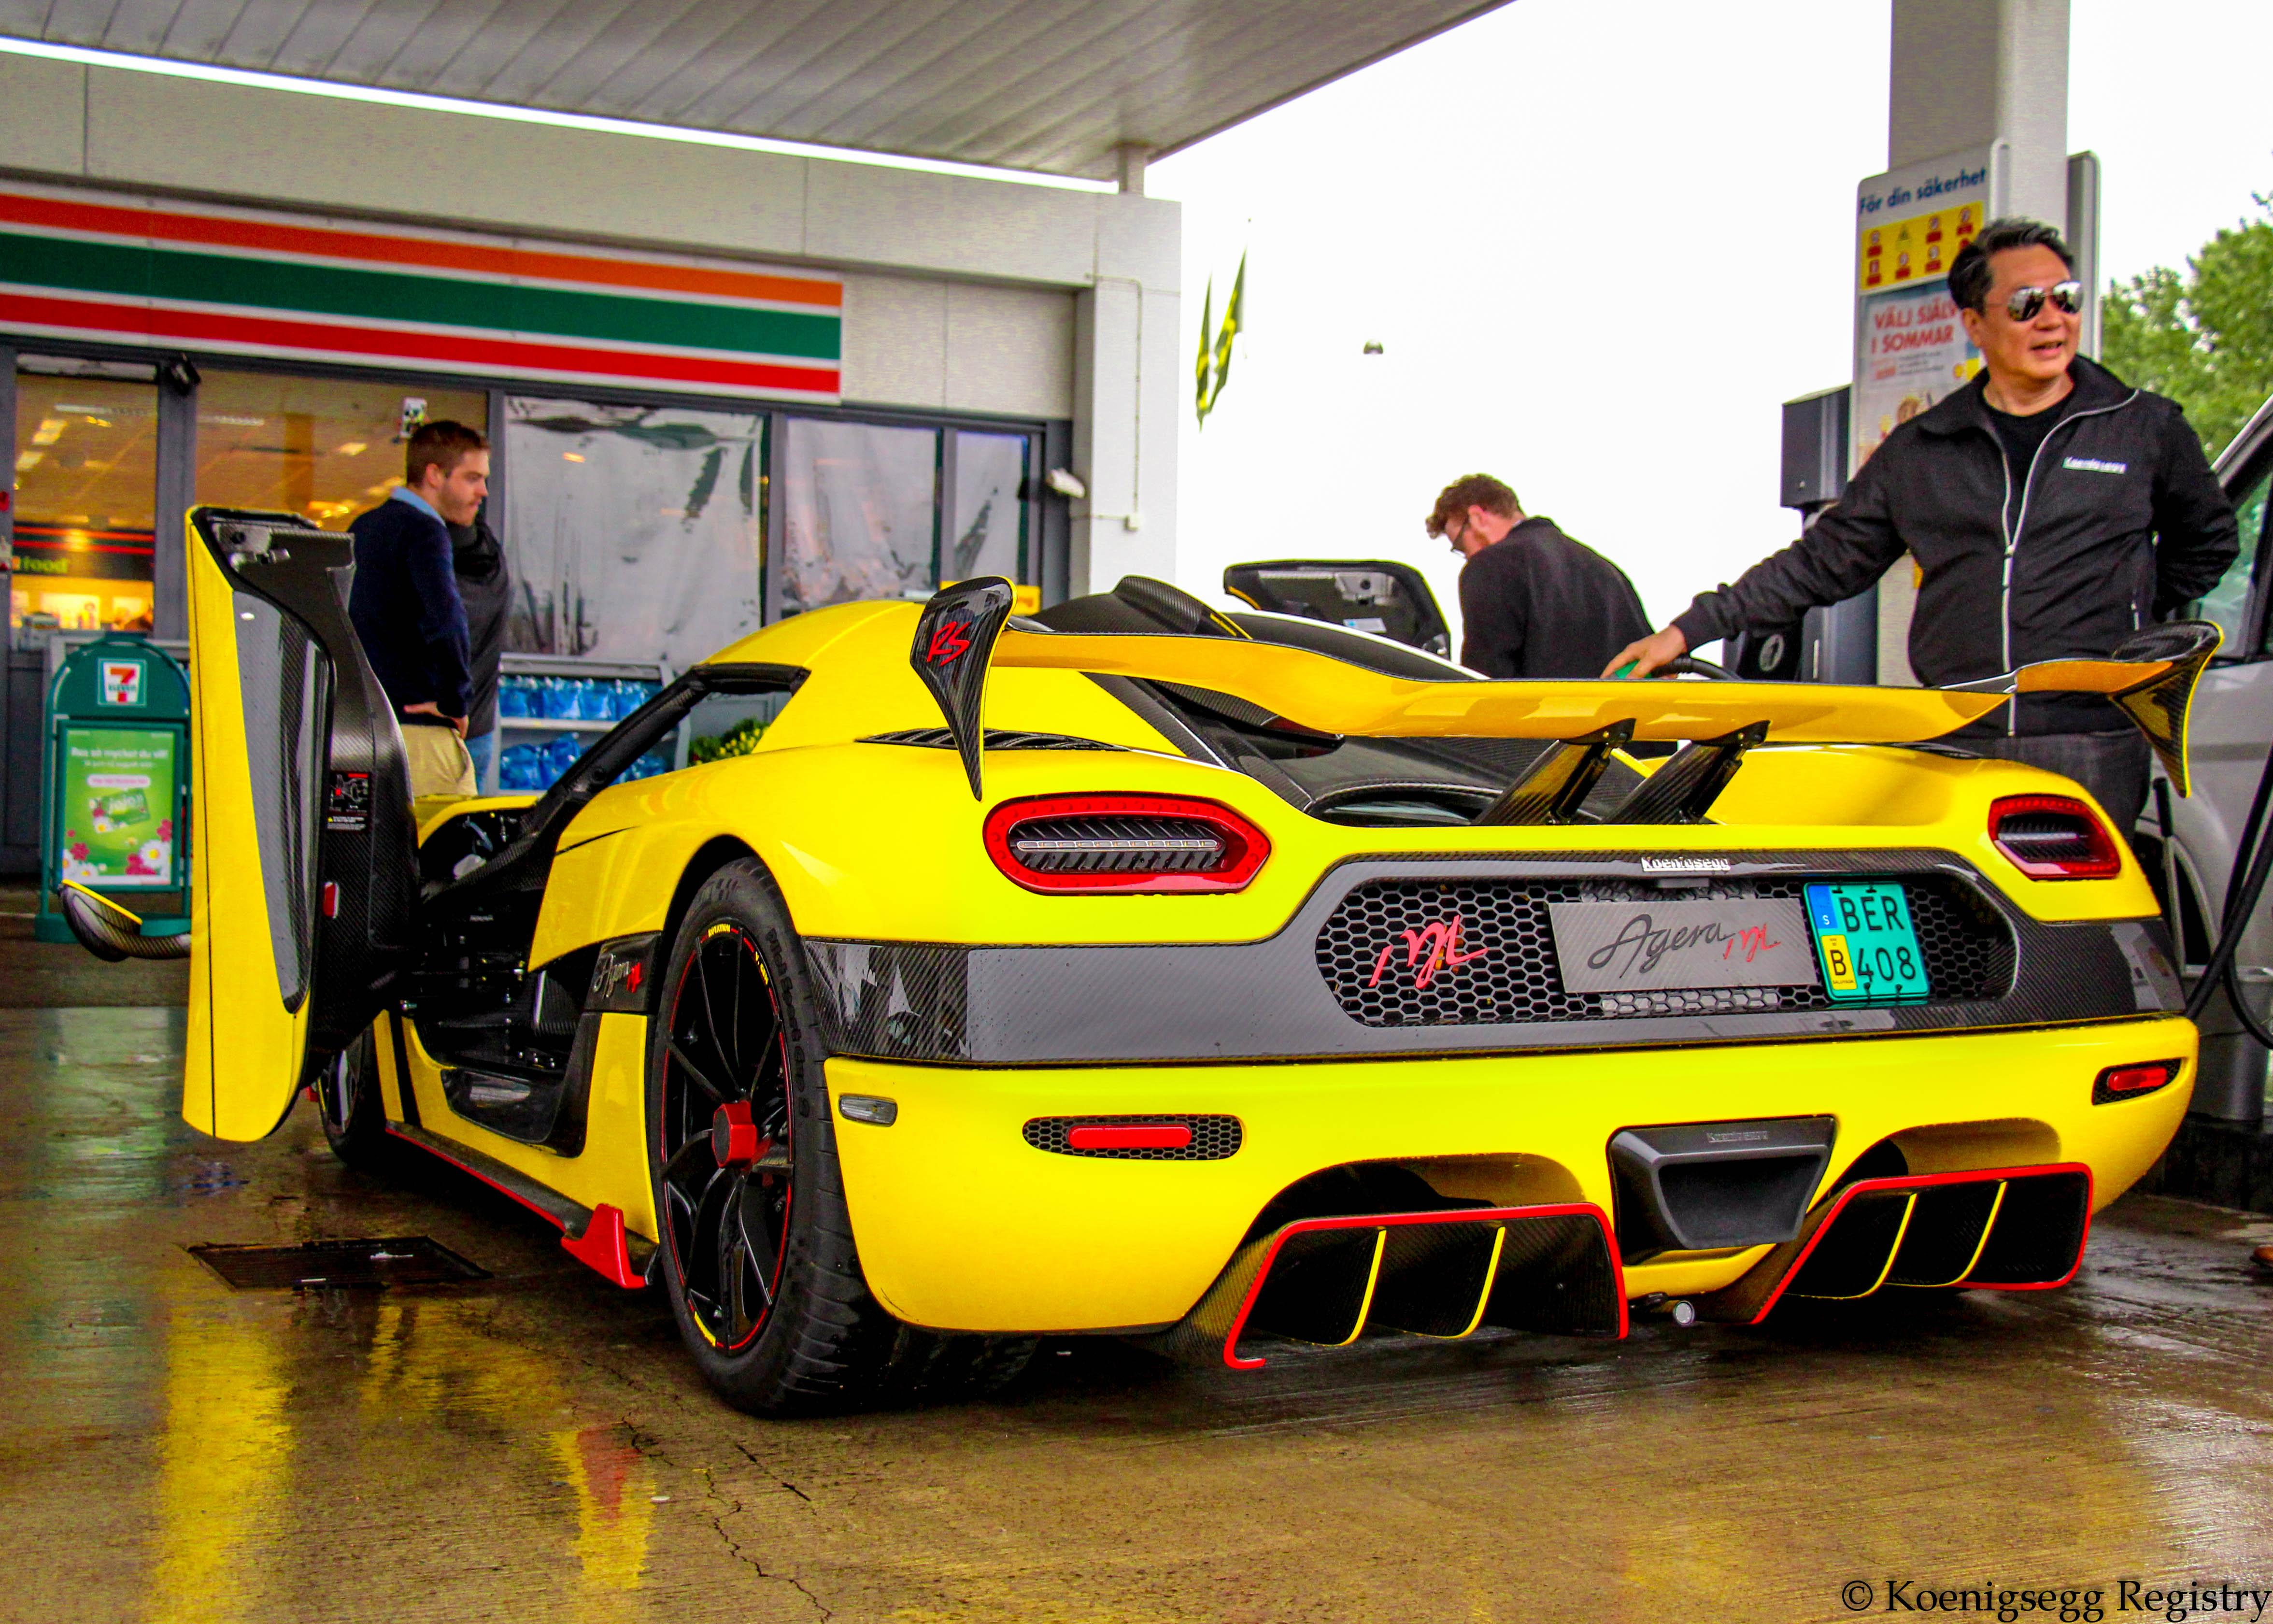 "#118 Agera RS ""ML"" - Loke Yellow w/red accents / black int. RHD-img_6129.jpg"